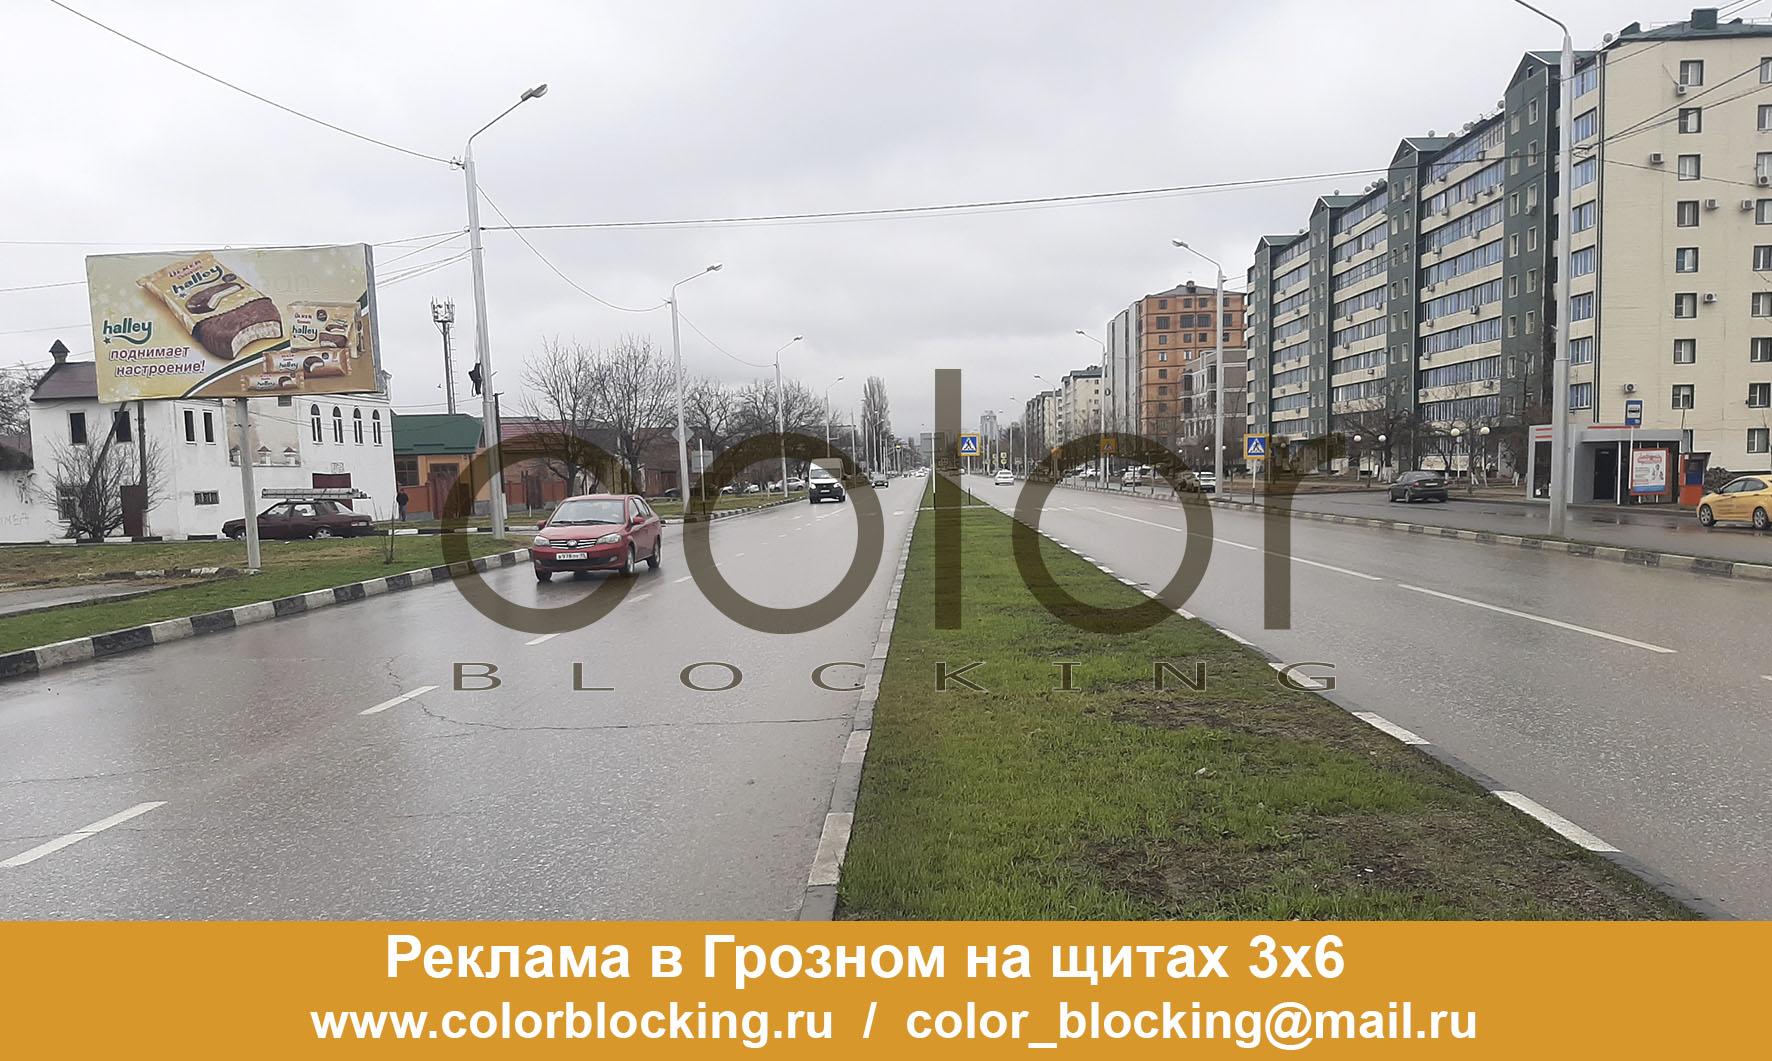 Реклама в Грозном на щитах 3х6 Айдамирова